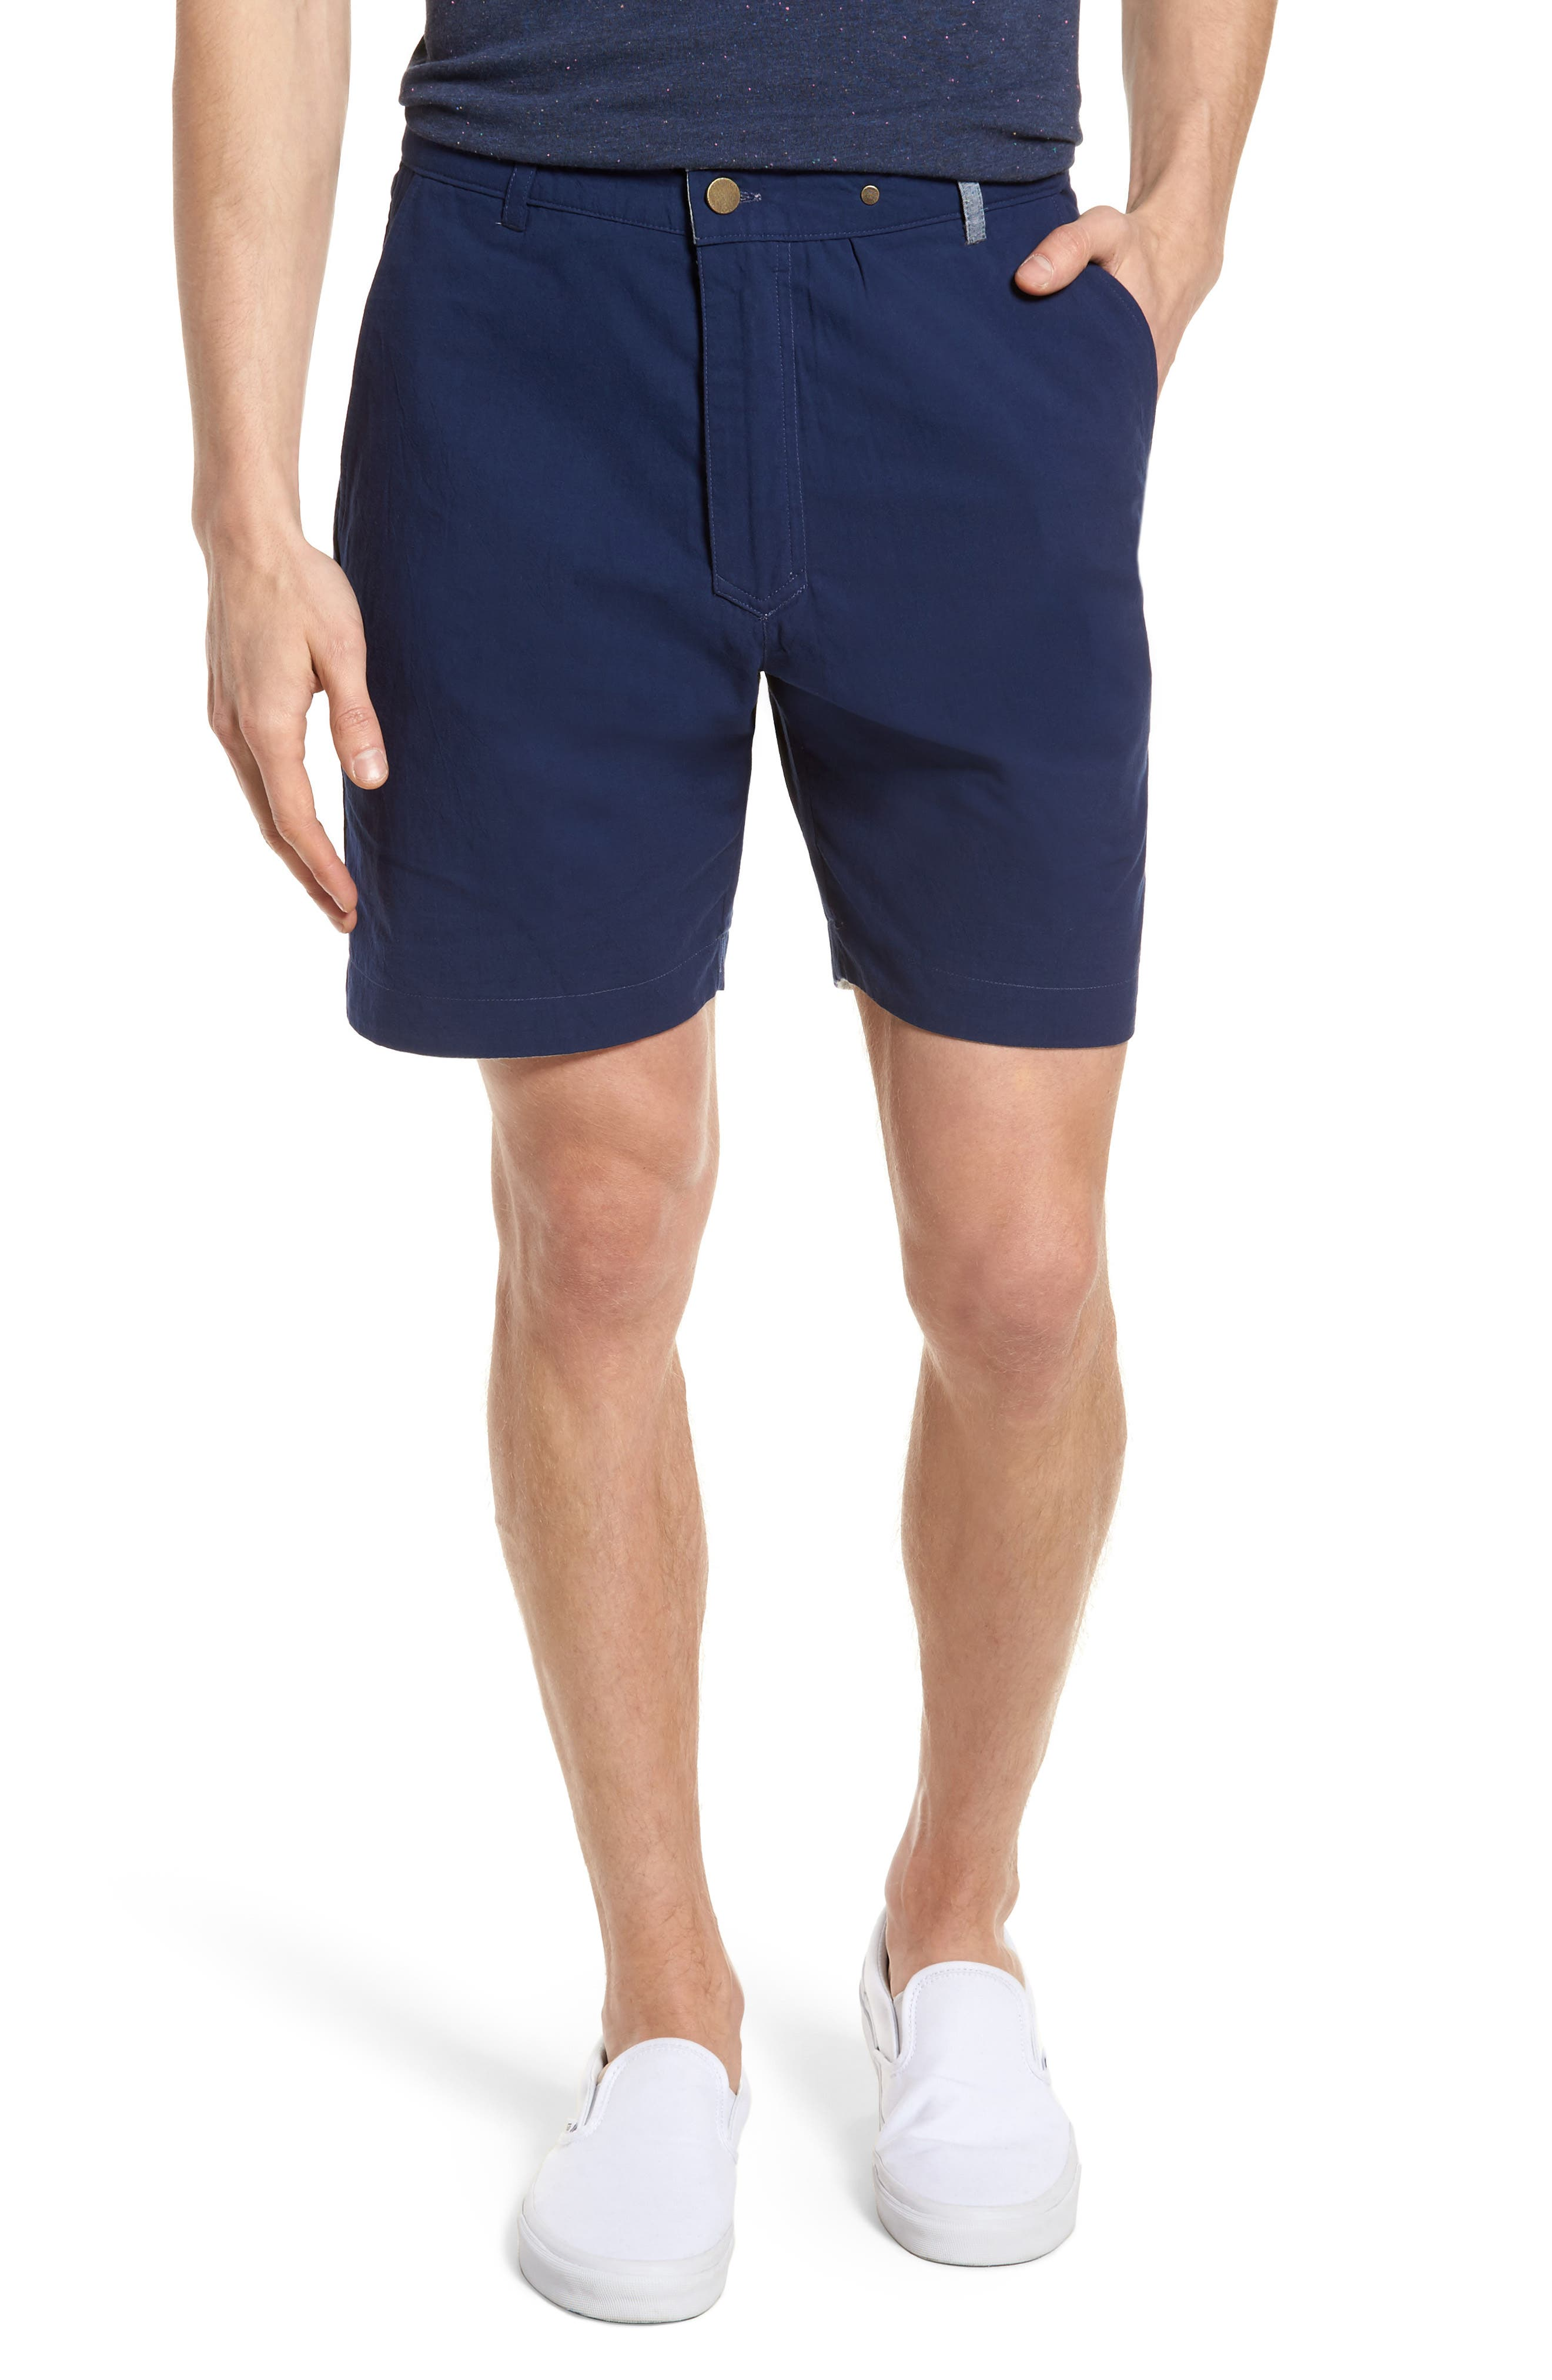 Rock Steady Reversible Shorts,                         Main,                         color,